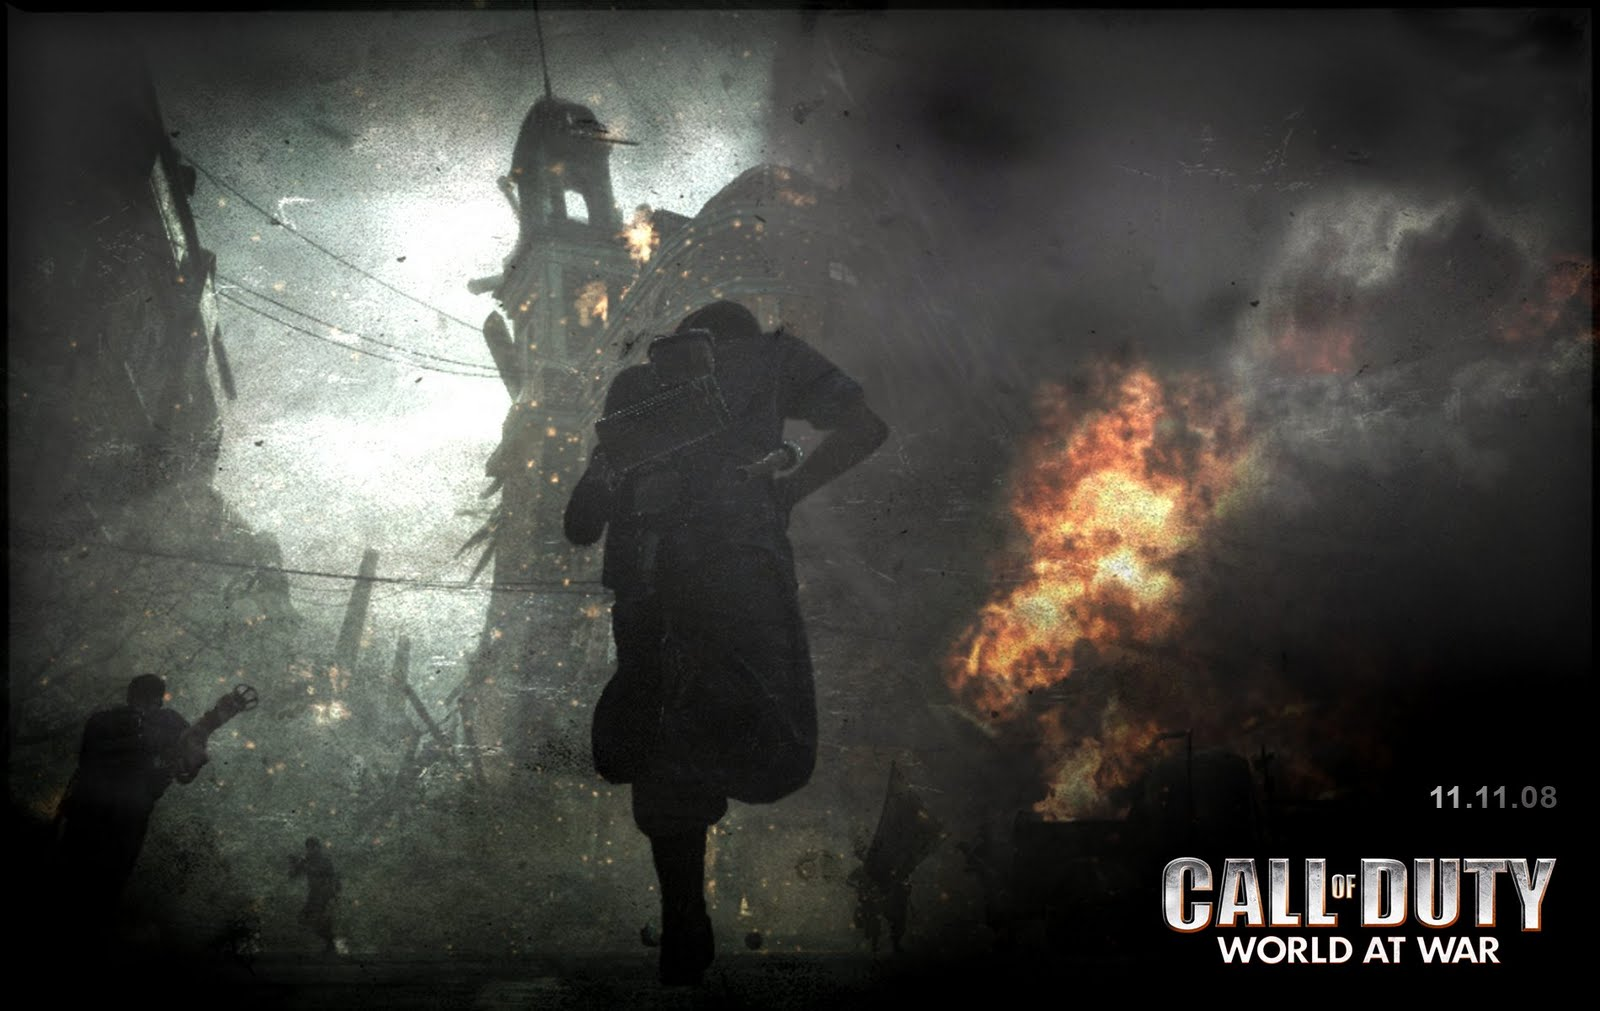 Wallpaper Collections: Call Of Duty World At War Wallpaper Hd